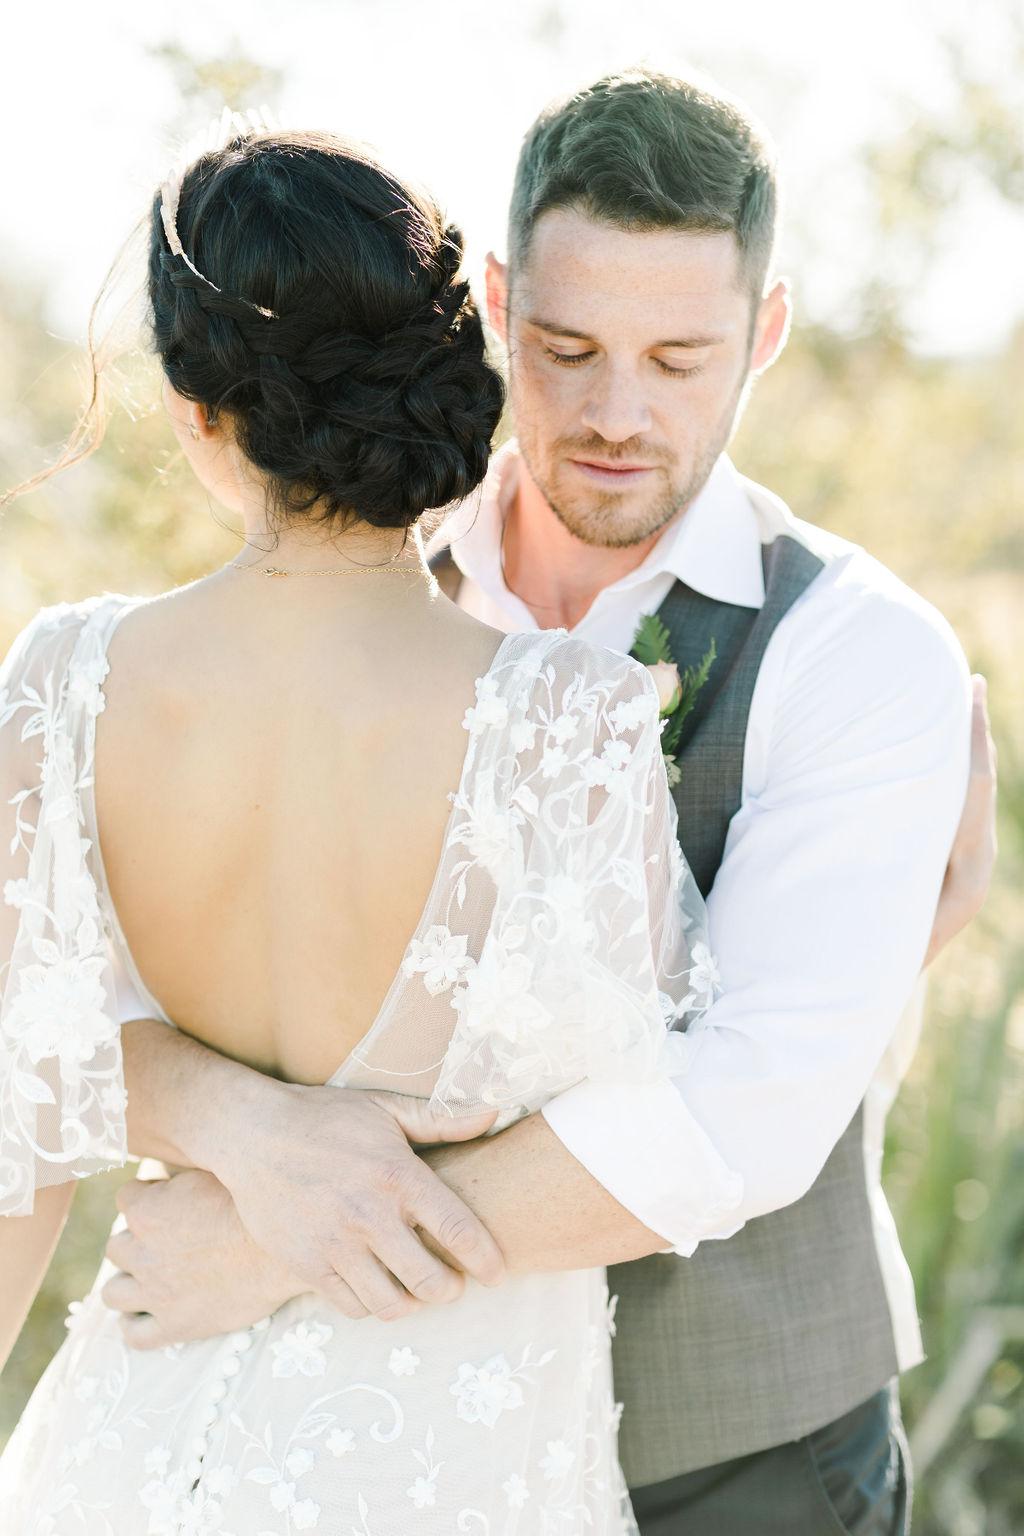 Wedding portraits for a Joshua Tree elopement